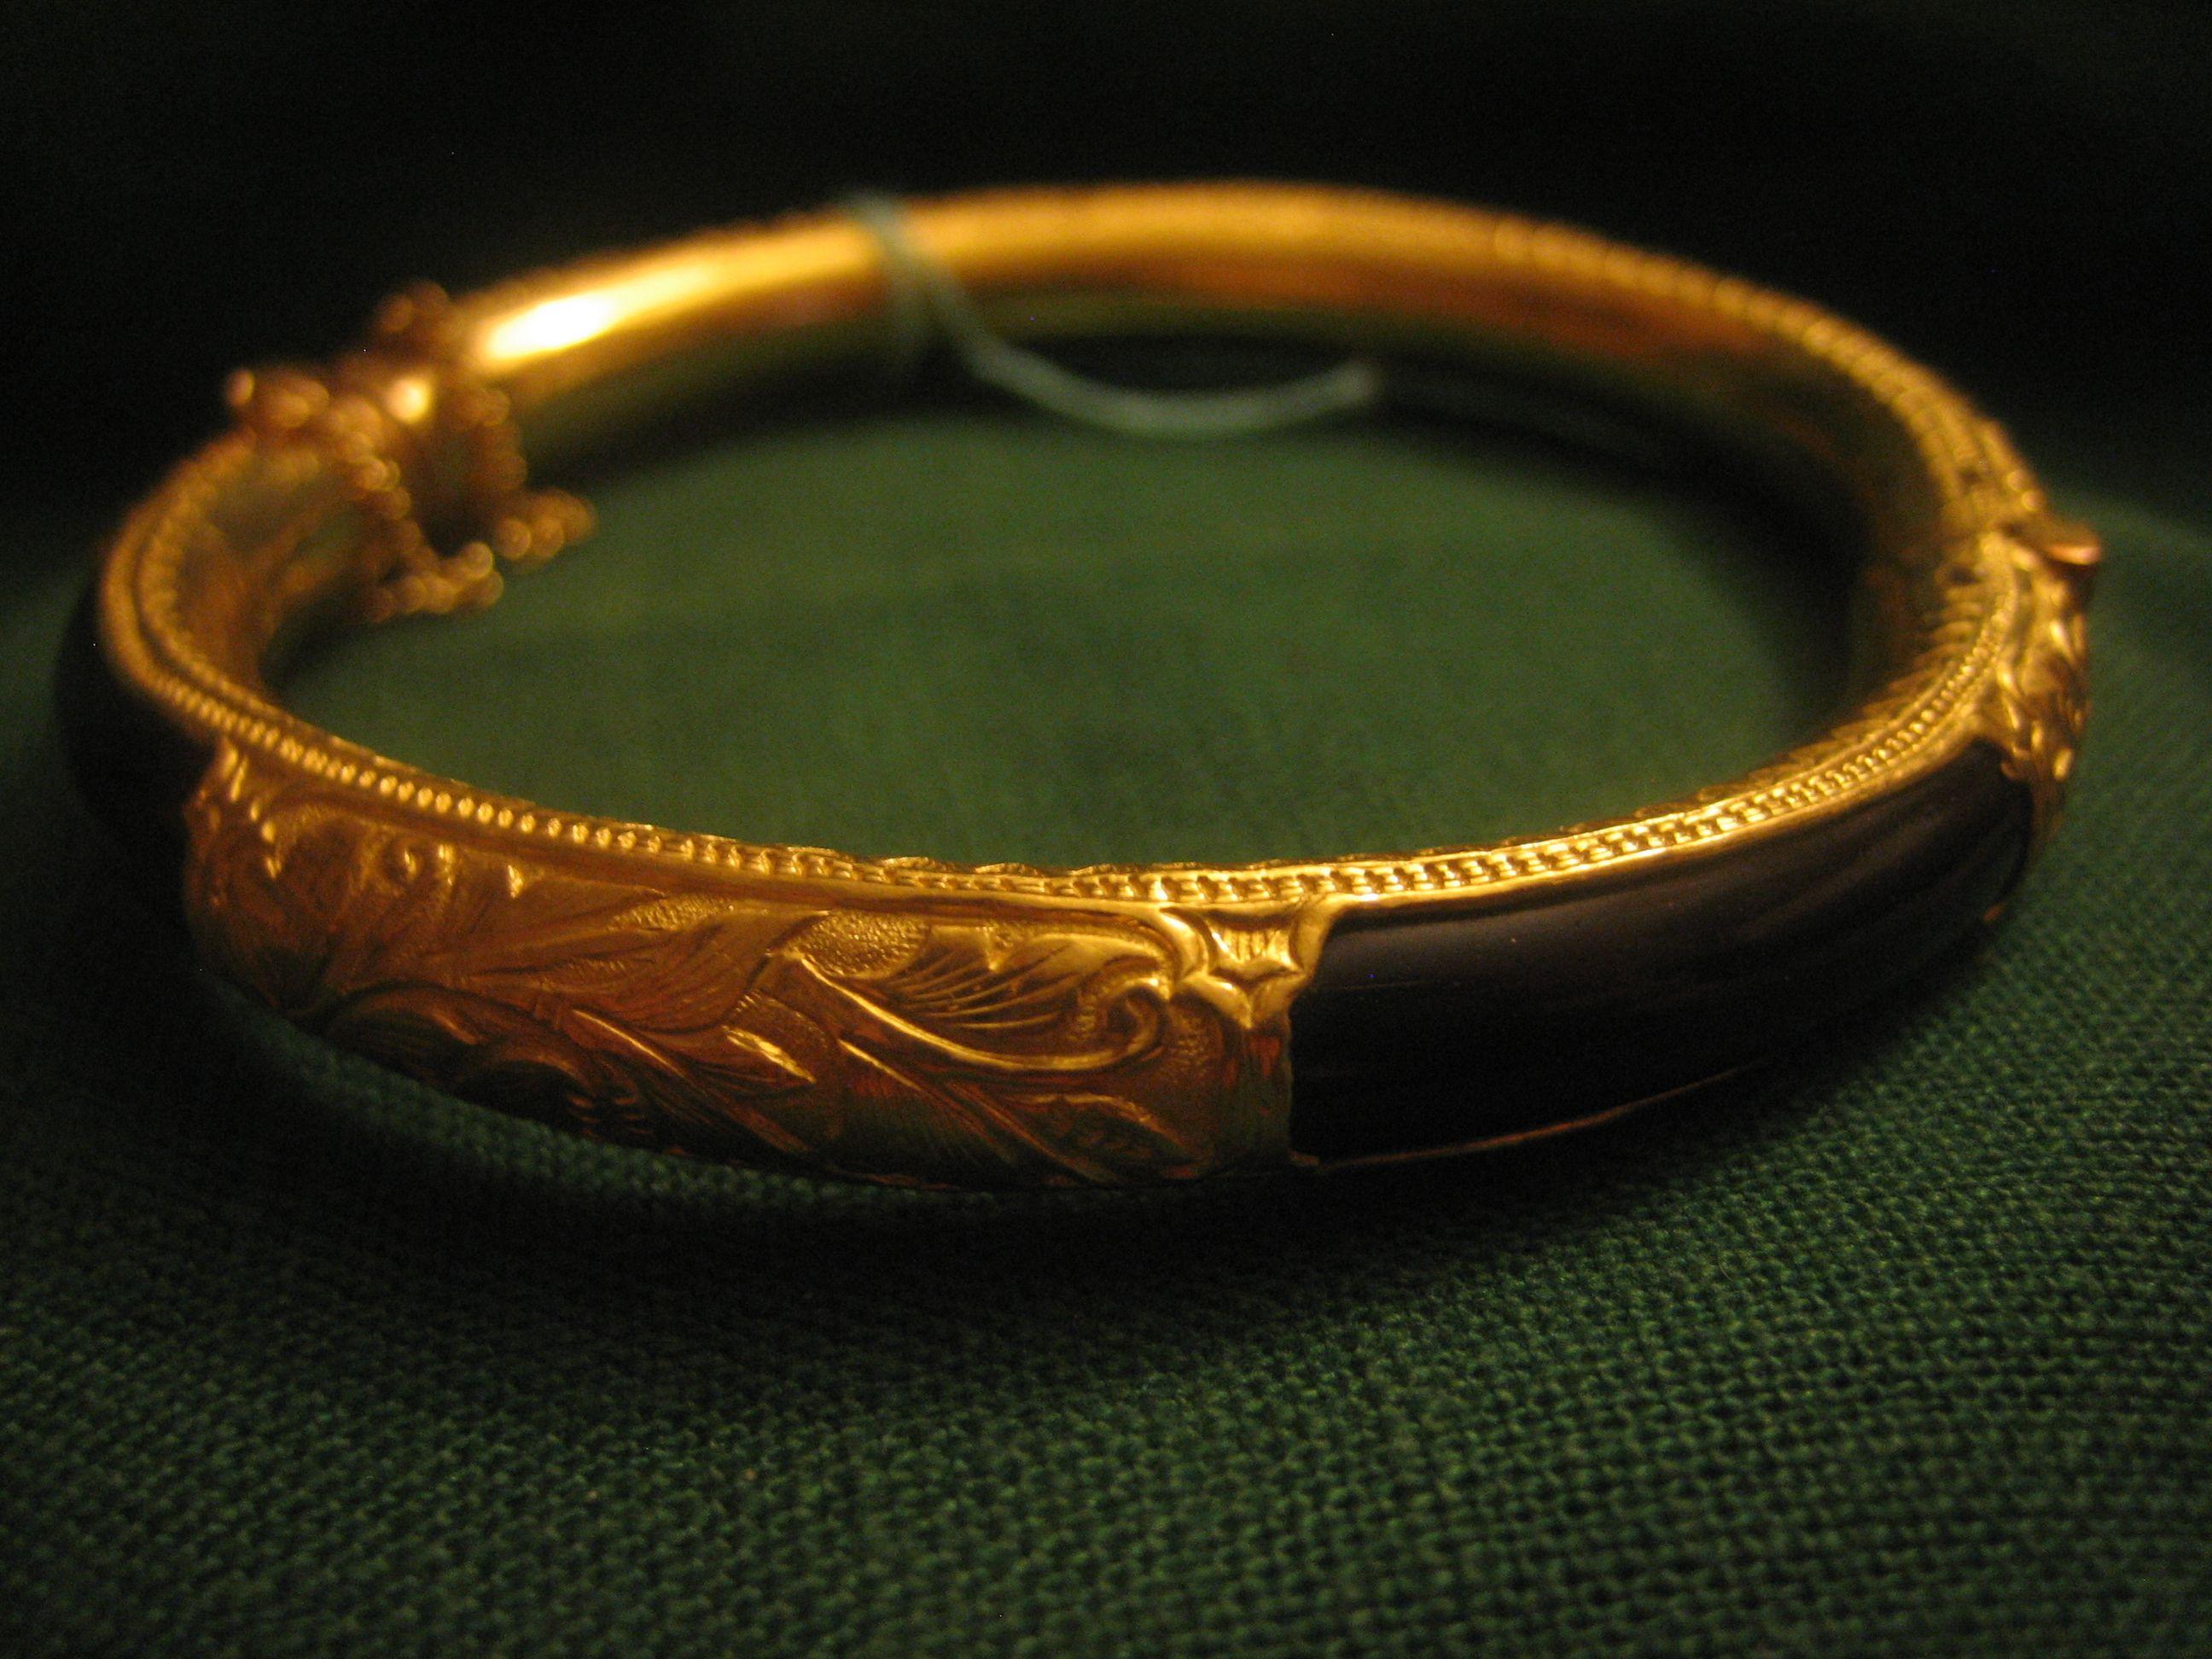 24 Karat Gold And Chinese Reed Bracelet